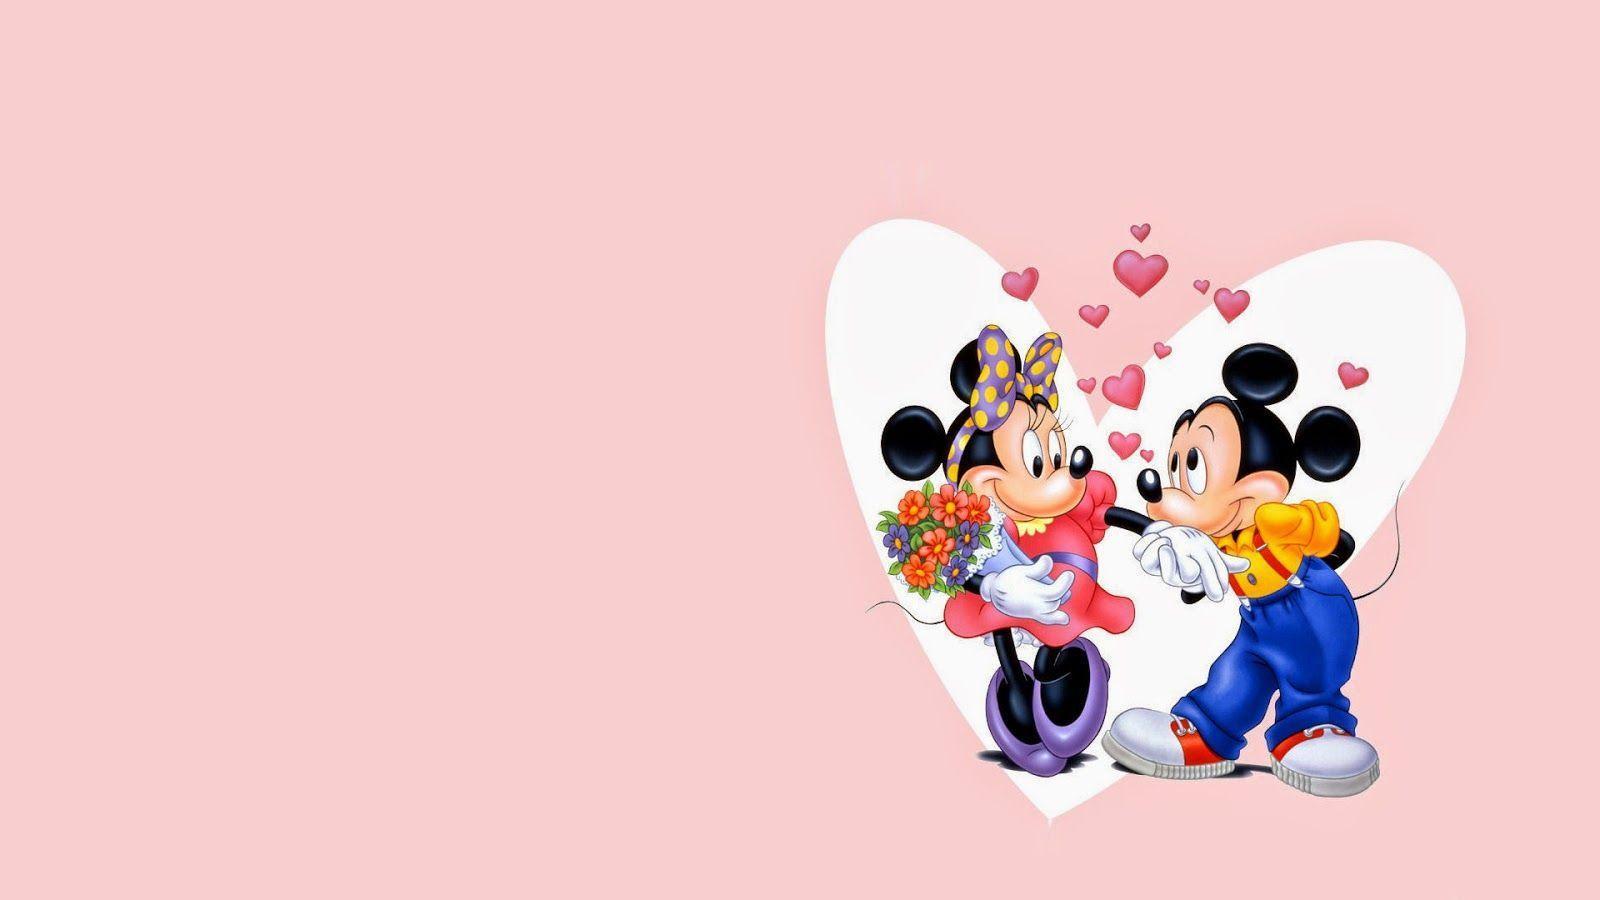 Disney Valentin Wallpapers Top Free Disney Valentin Backgrounds